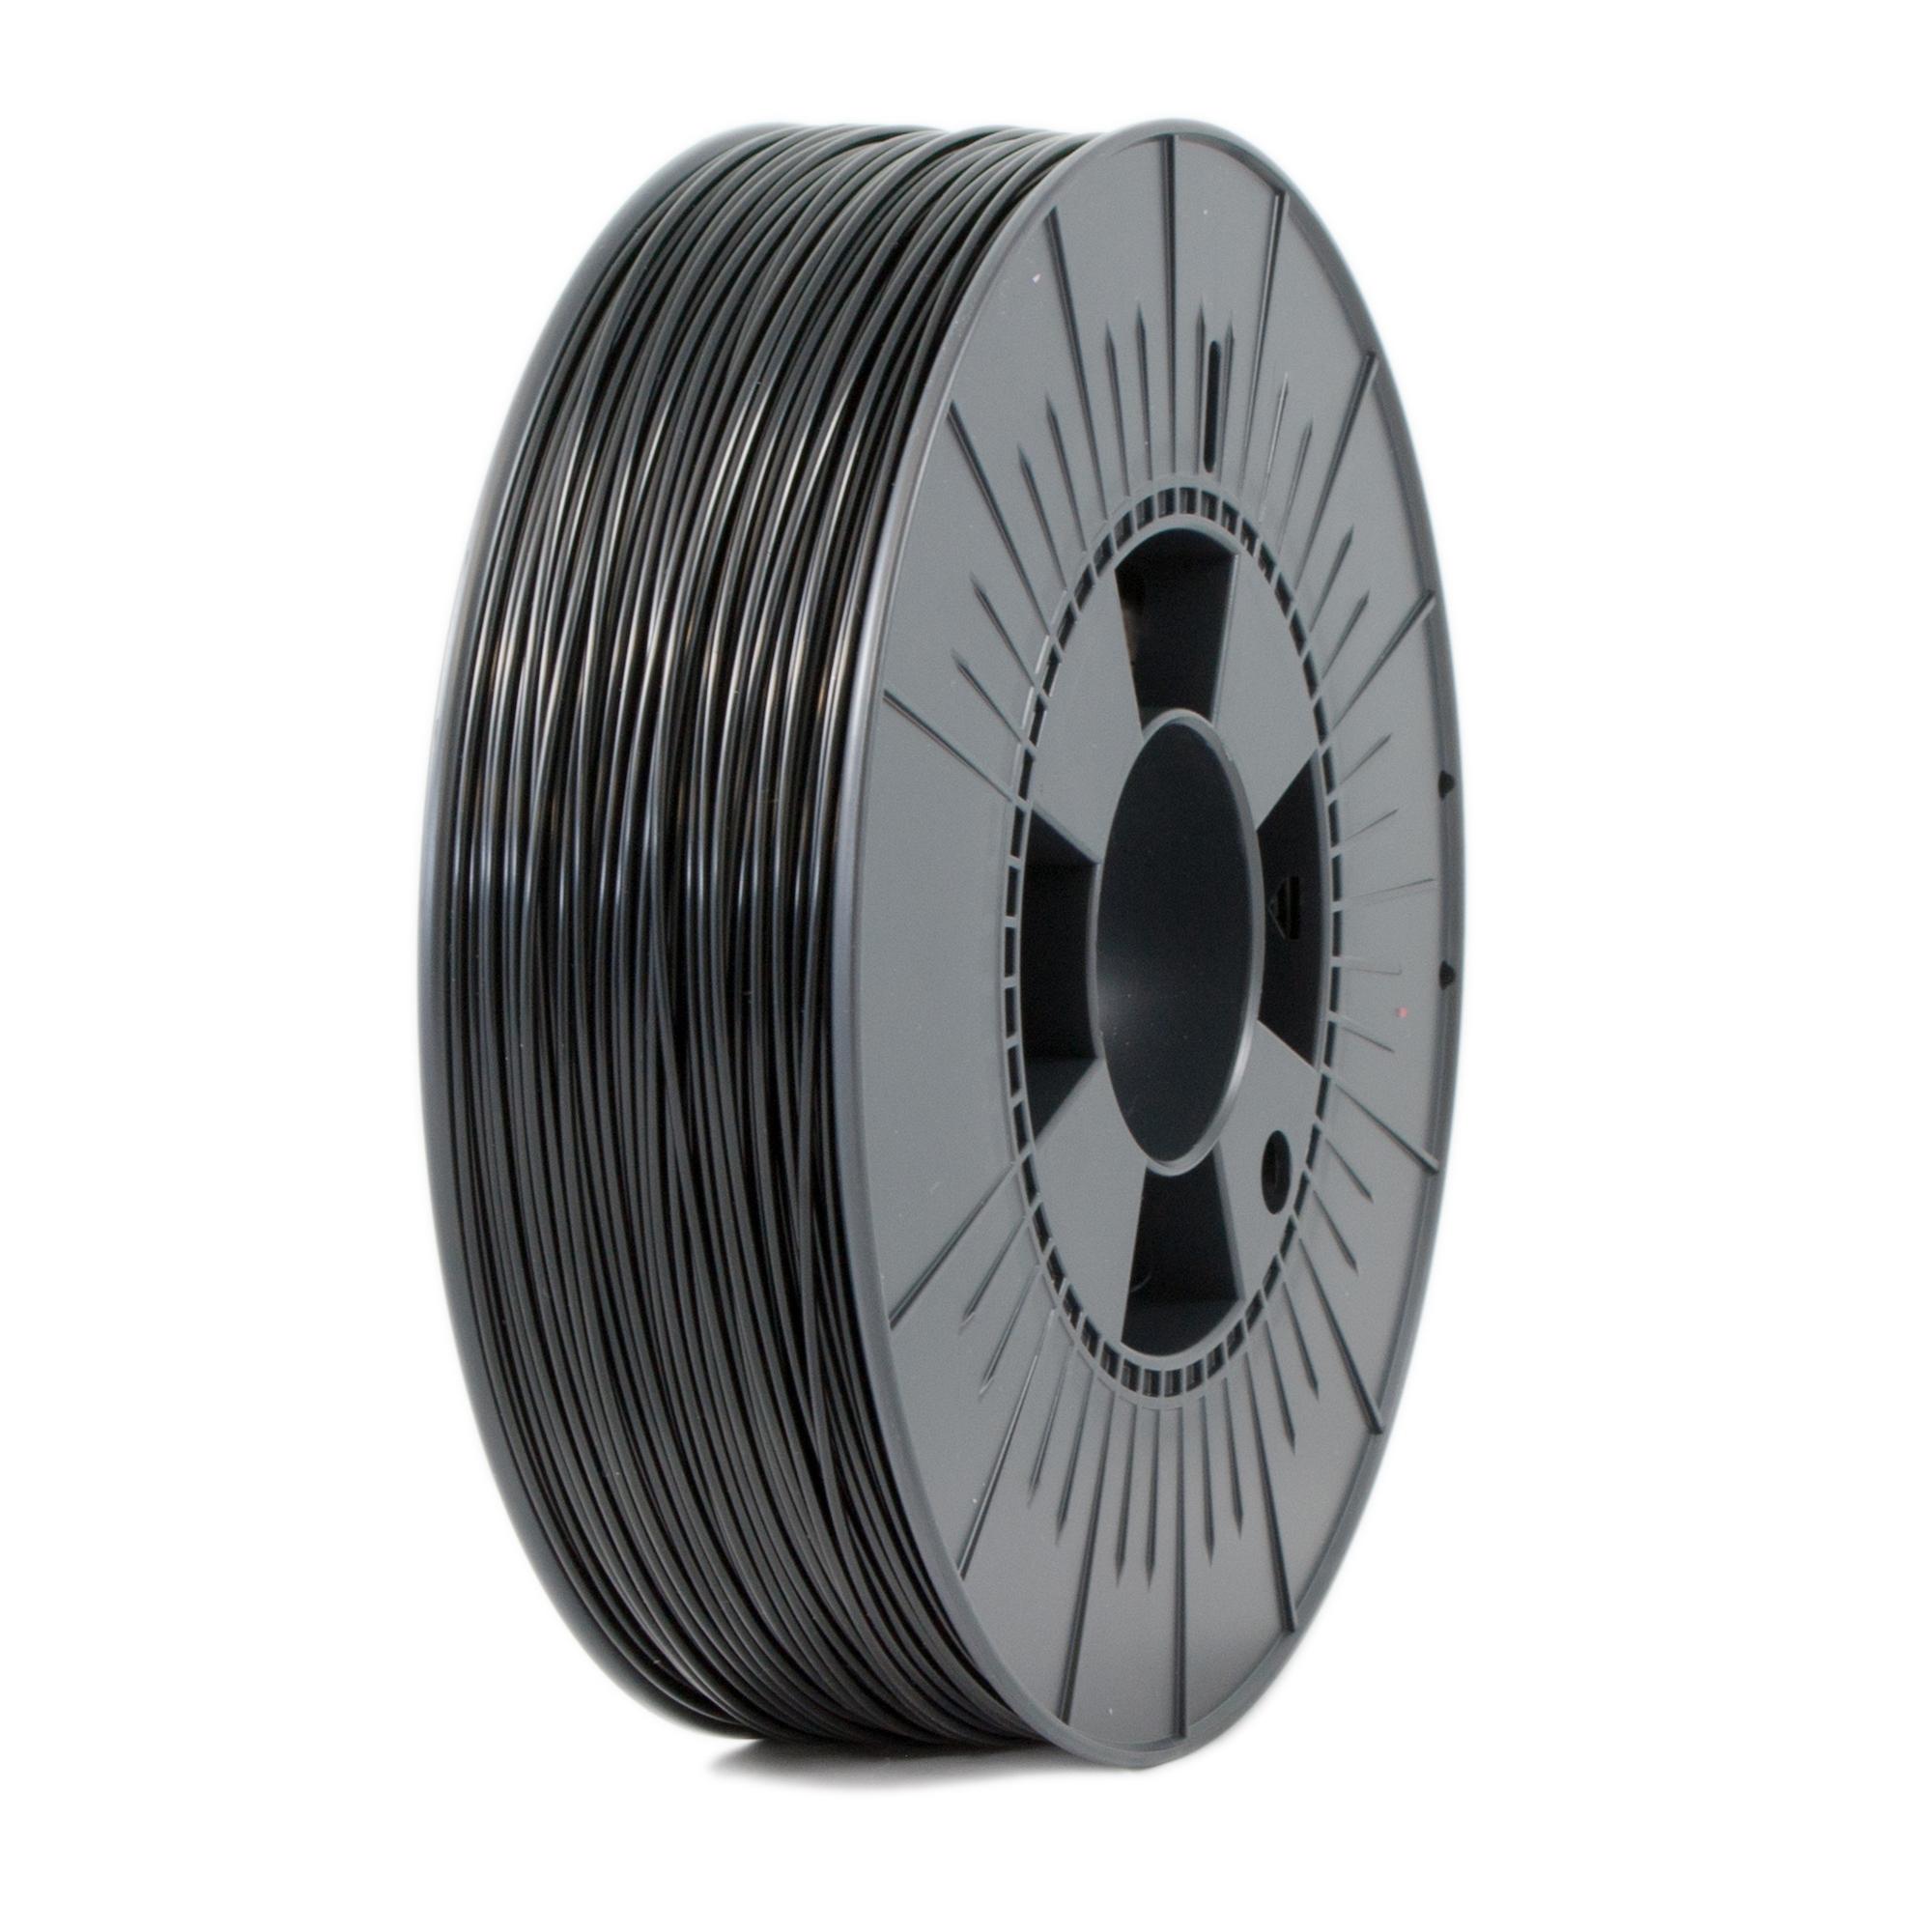 Filamentive Black bioPC 2.85 mm